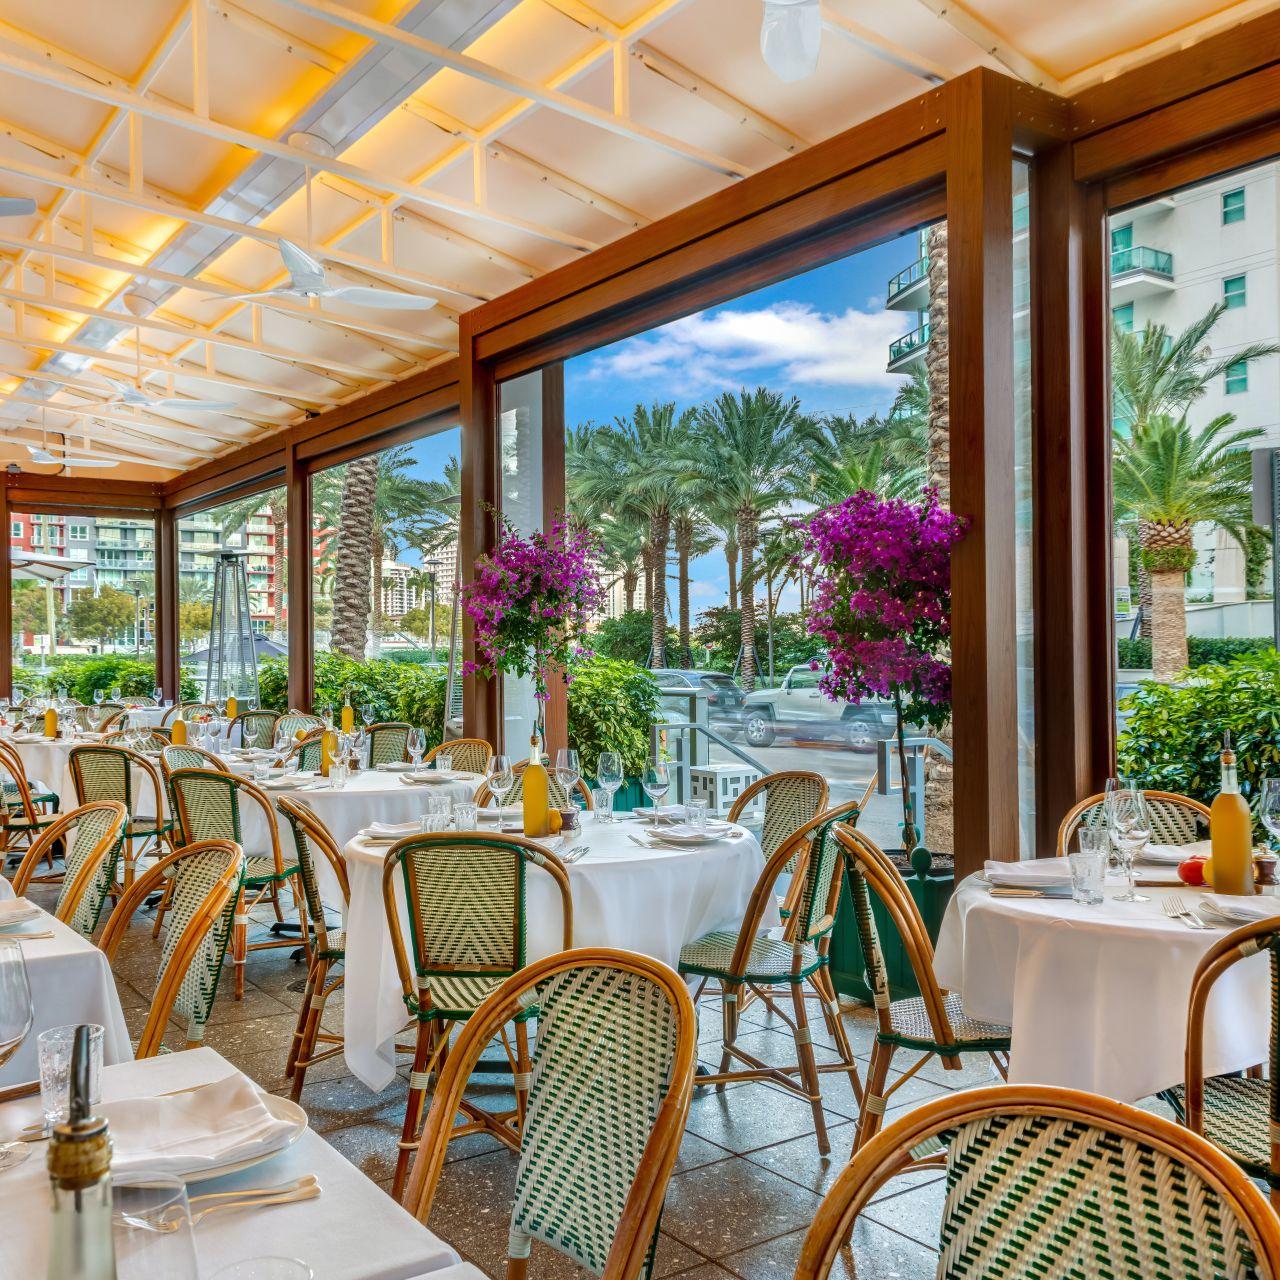 La Petite Maison Atlanta lpm restaurant and bar - miami, fl | opentable